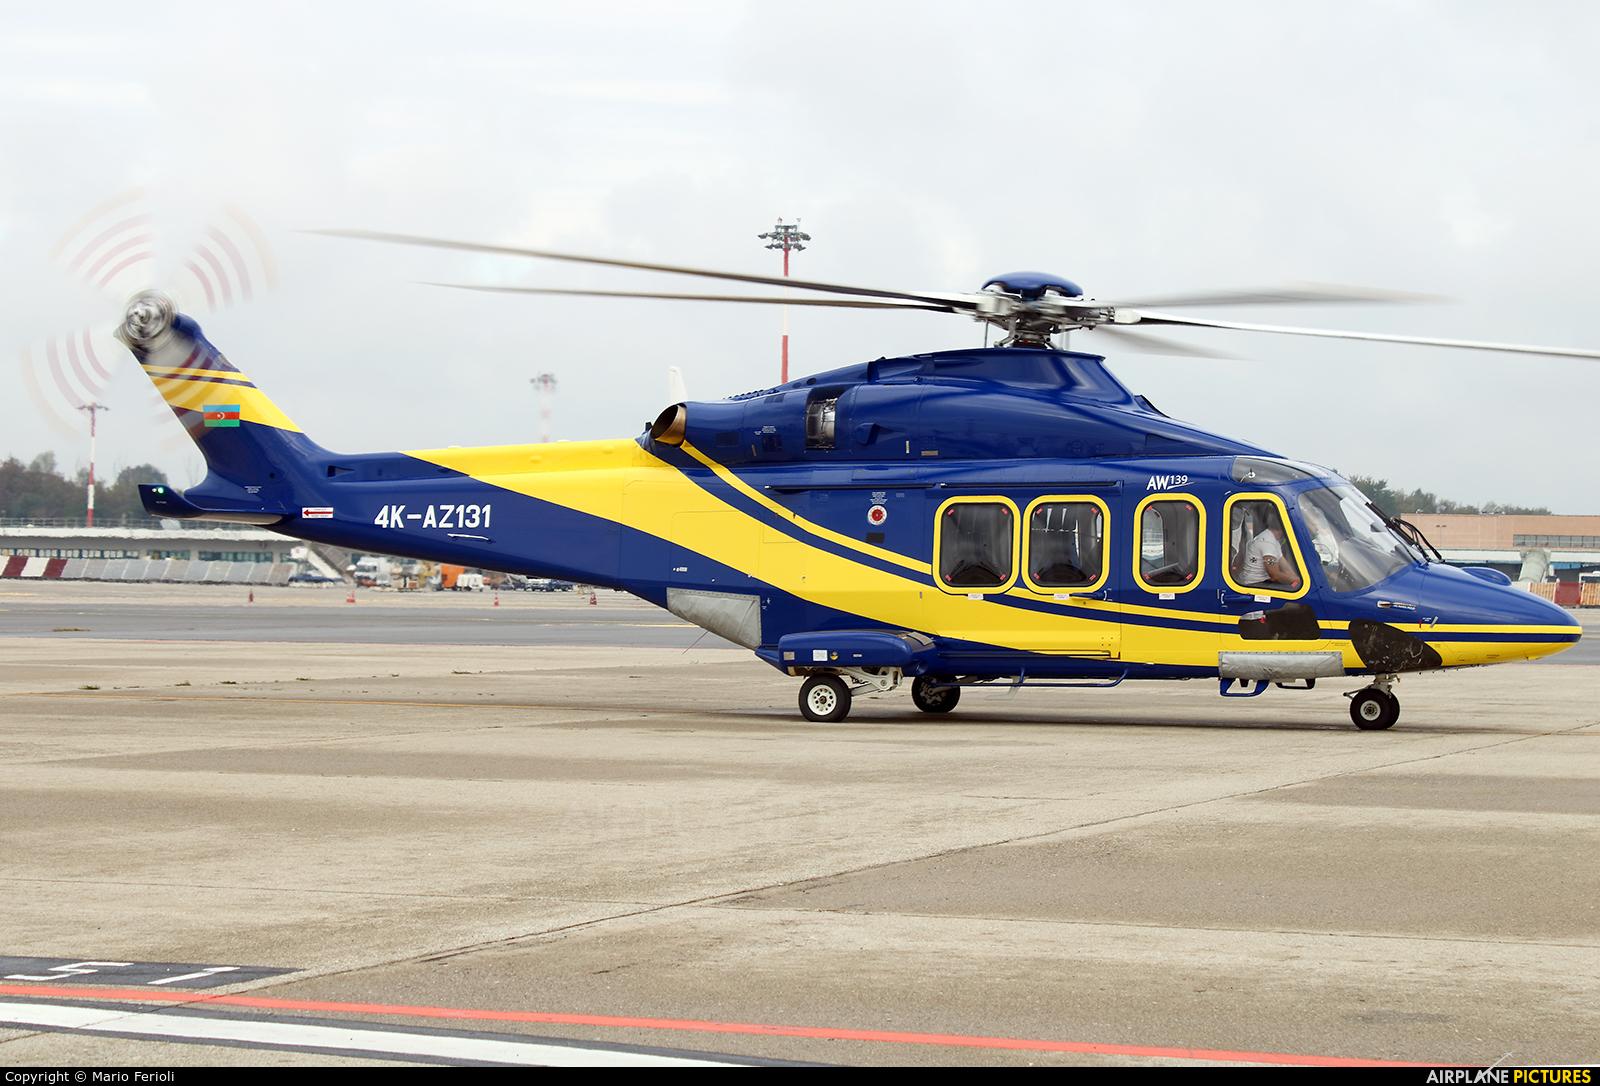 Silk Way Helicopter Services 4K-AZ131 aircraft at Milan - Malpensa